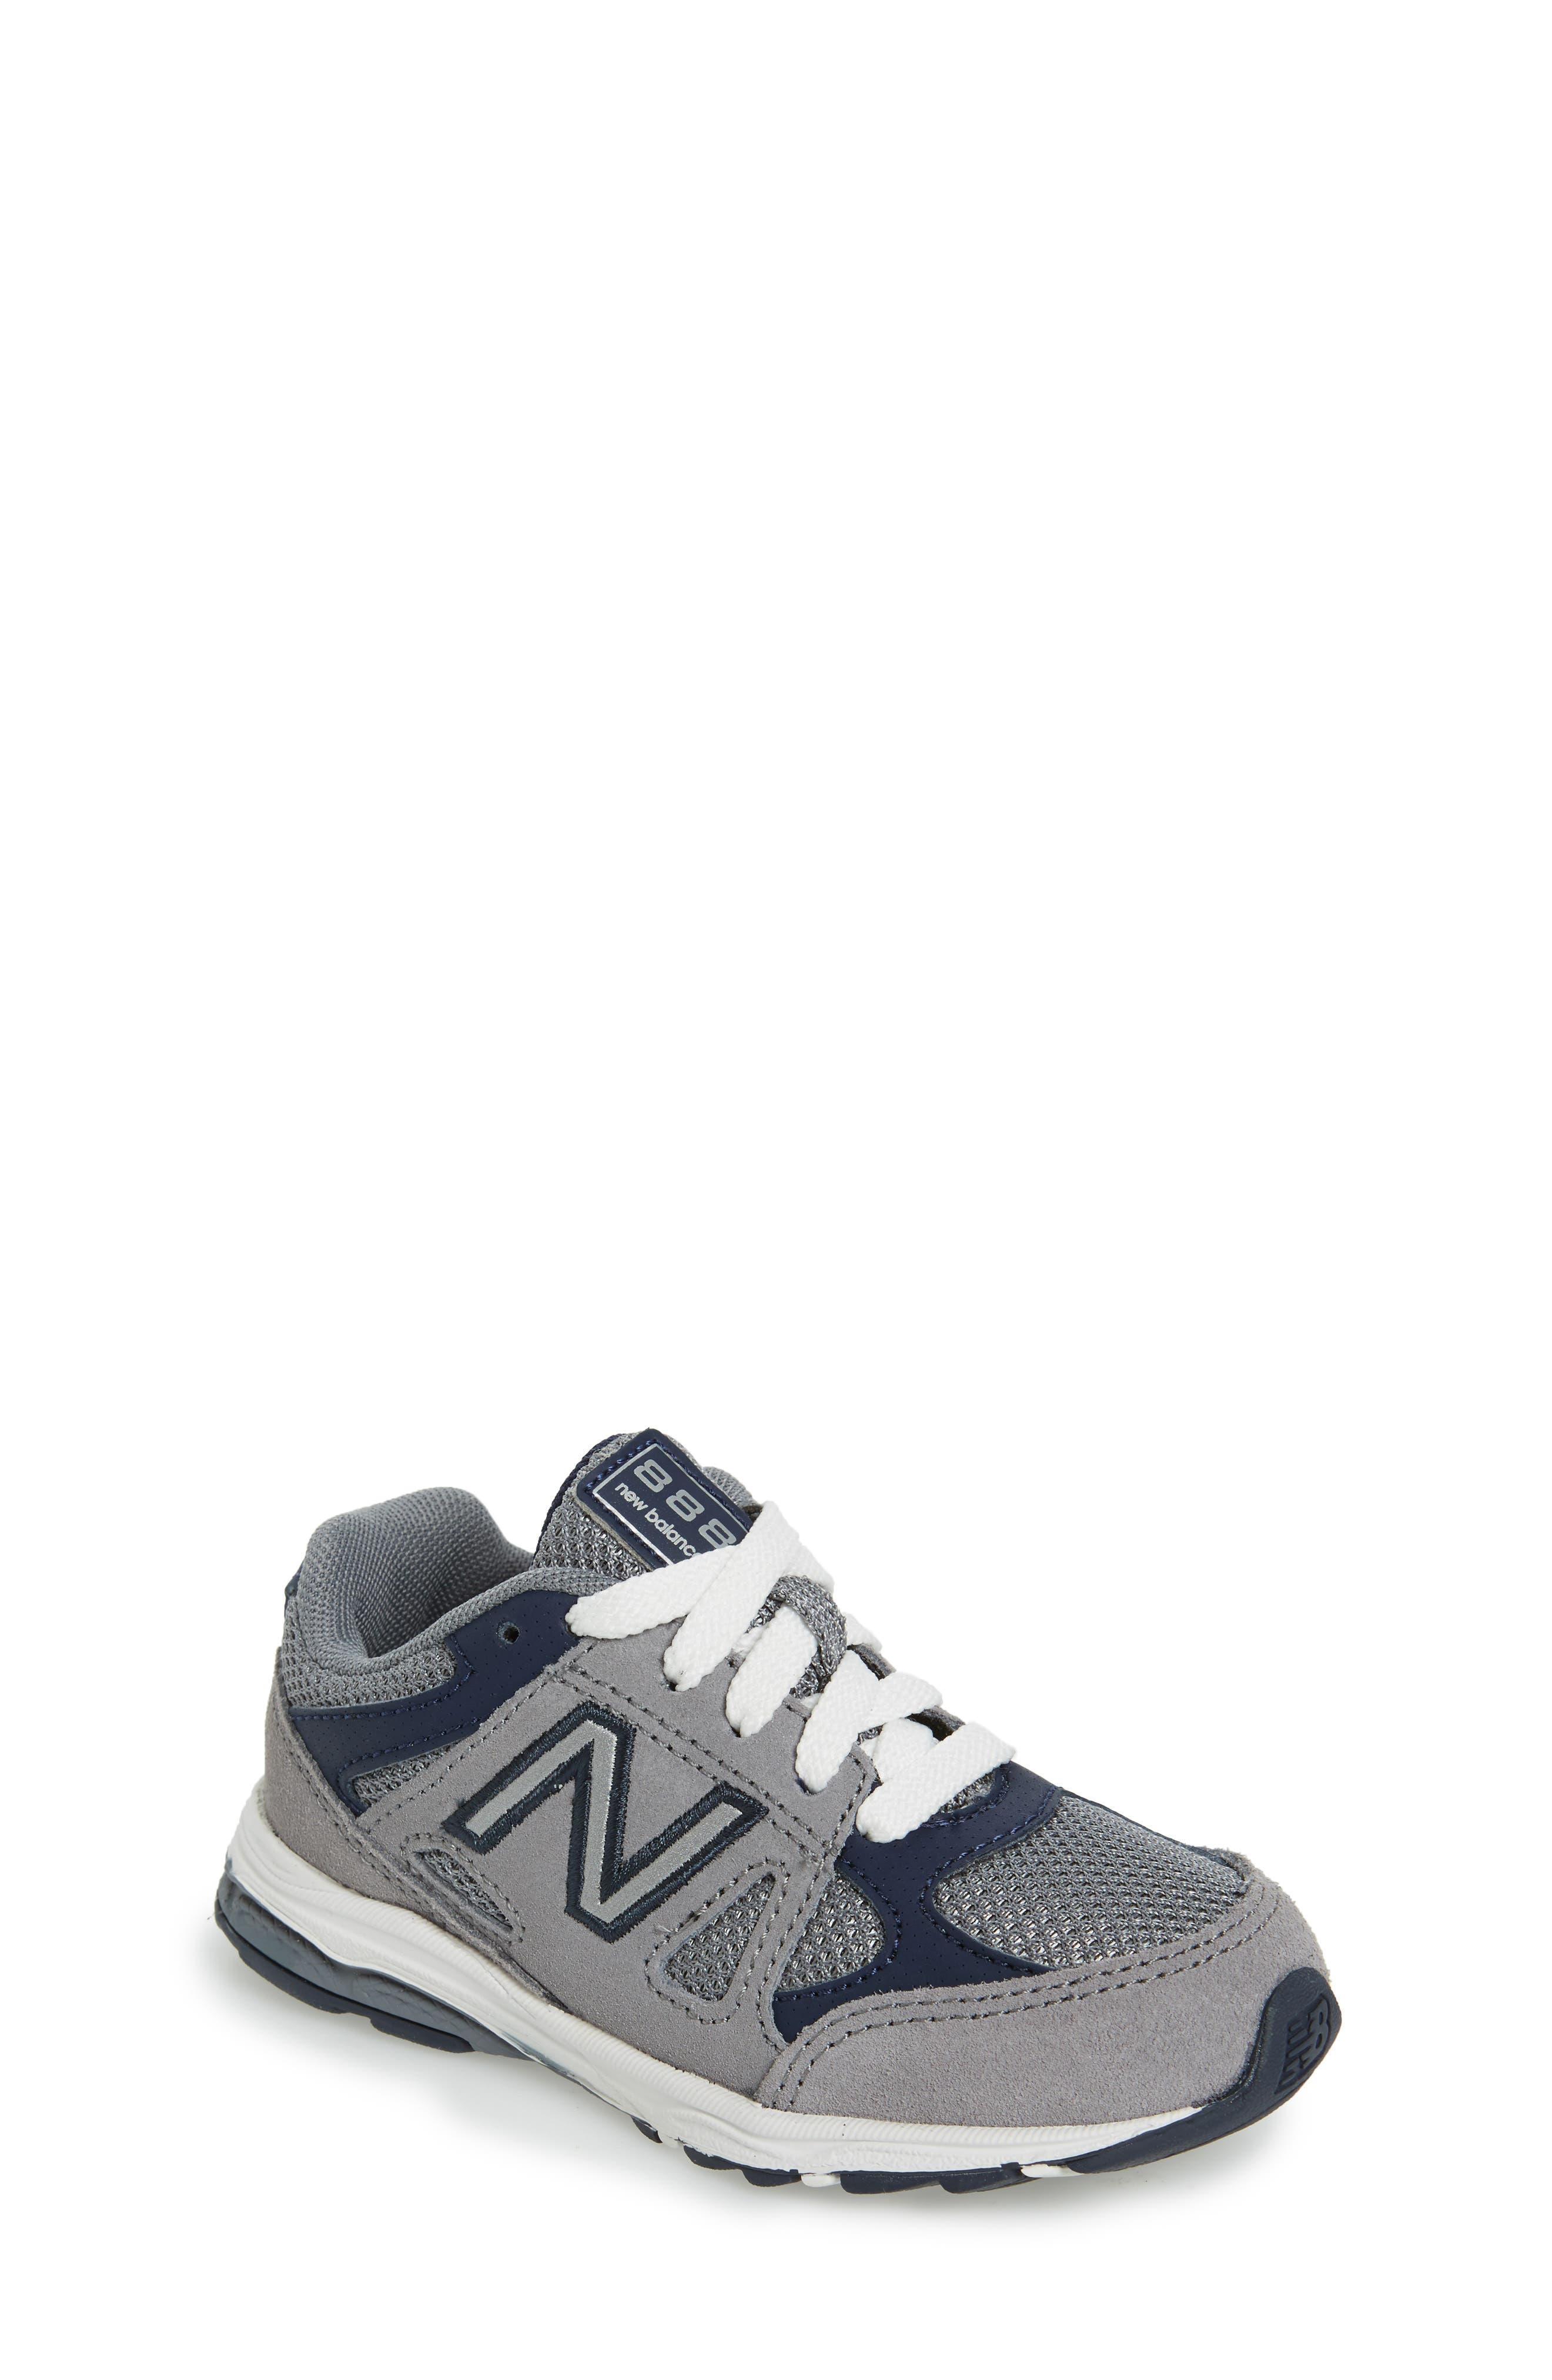 888 Sneaker,                             Main thumbnail 1, color,                             033